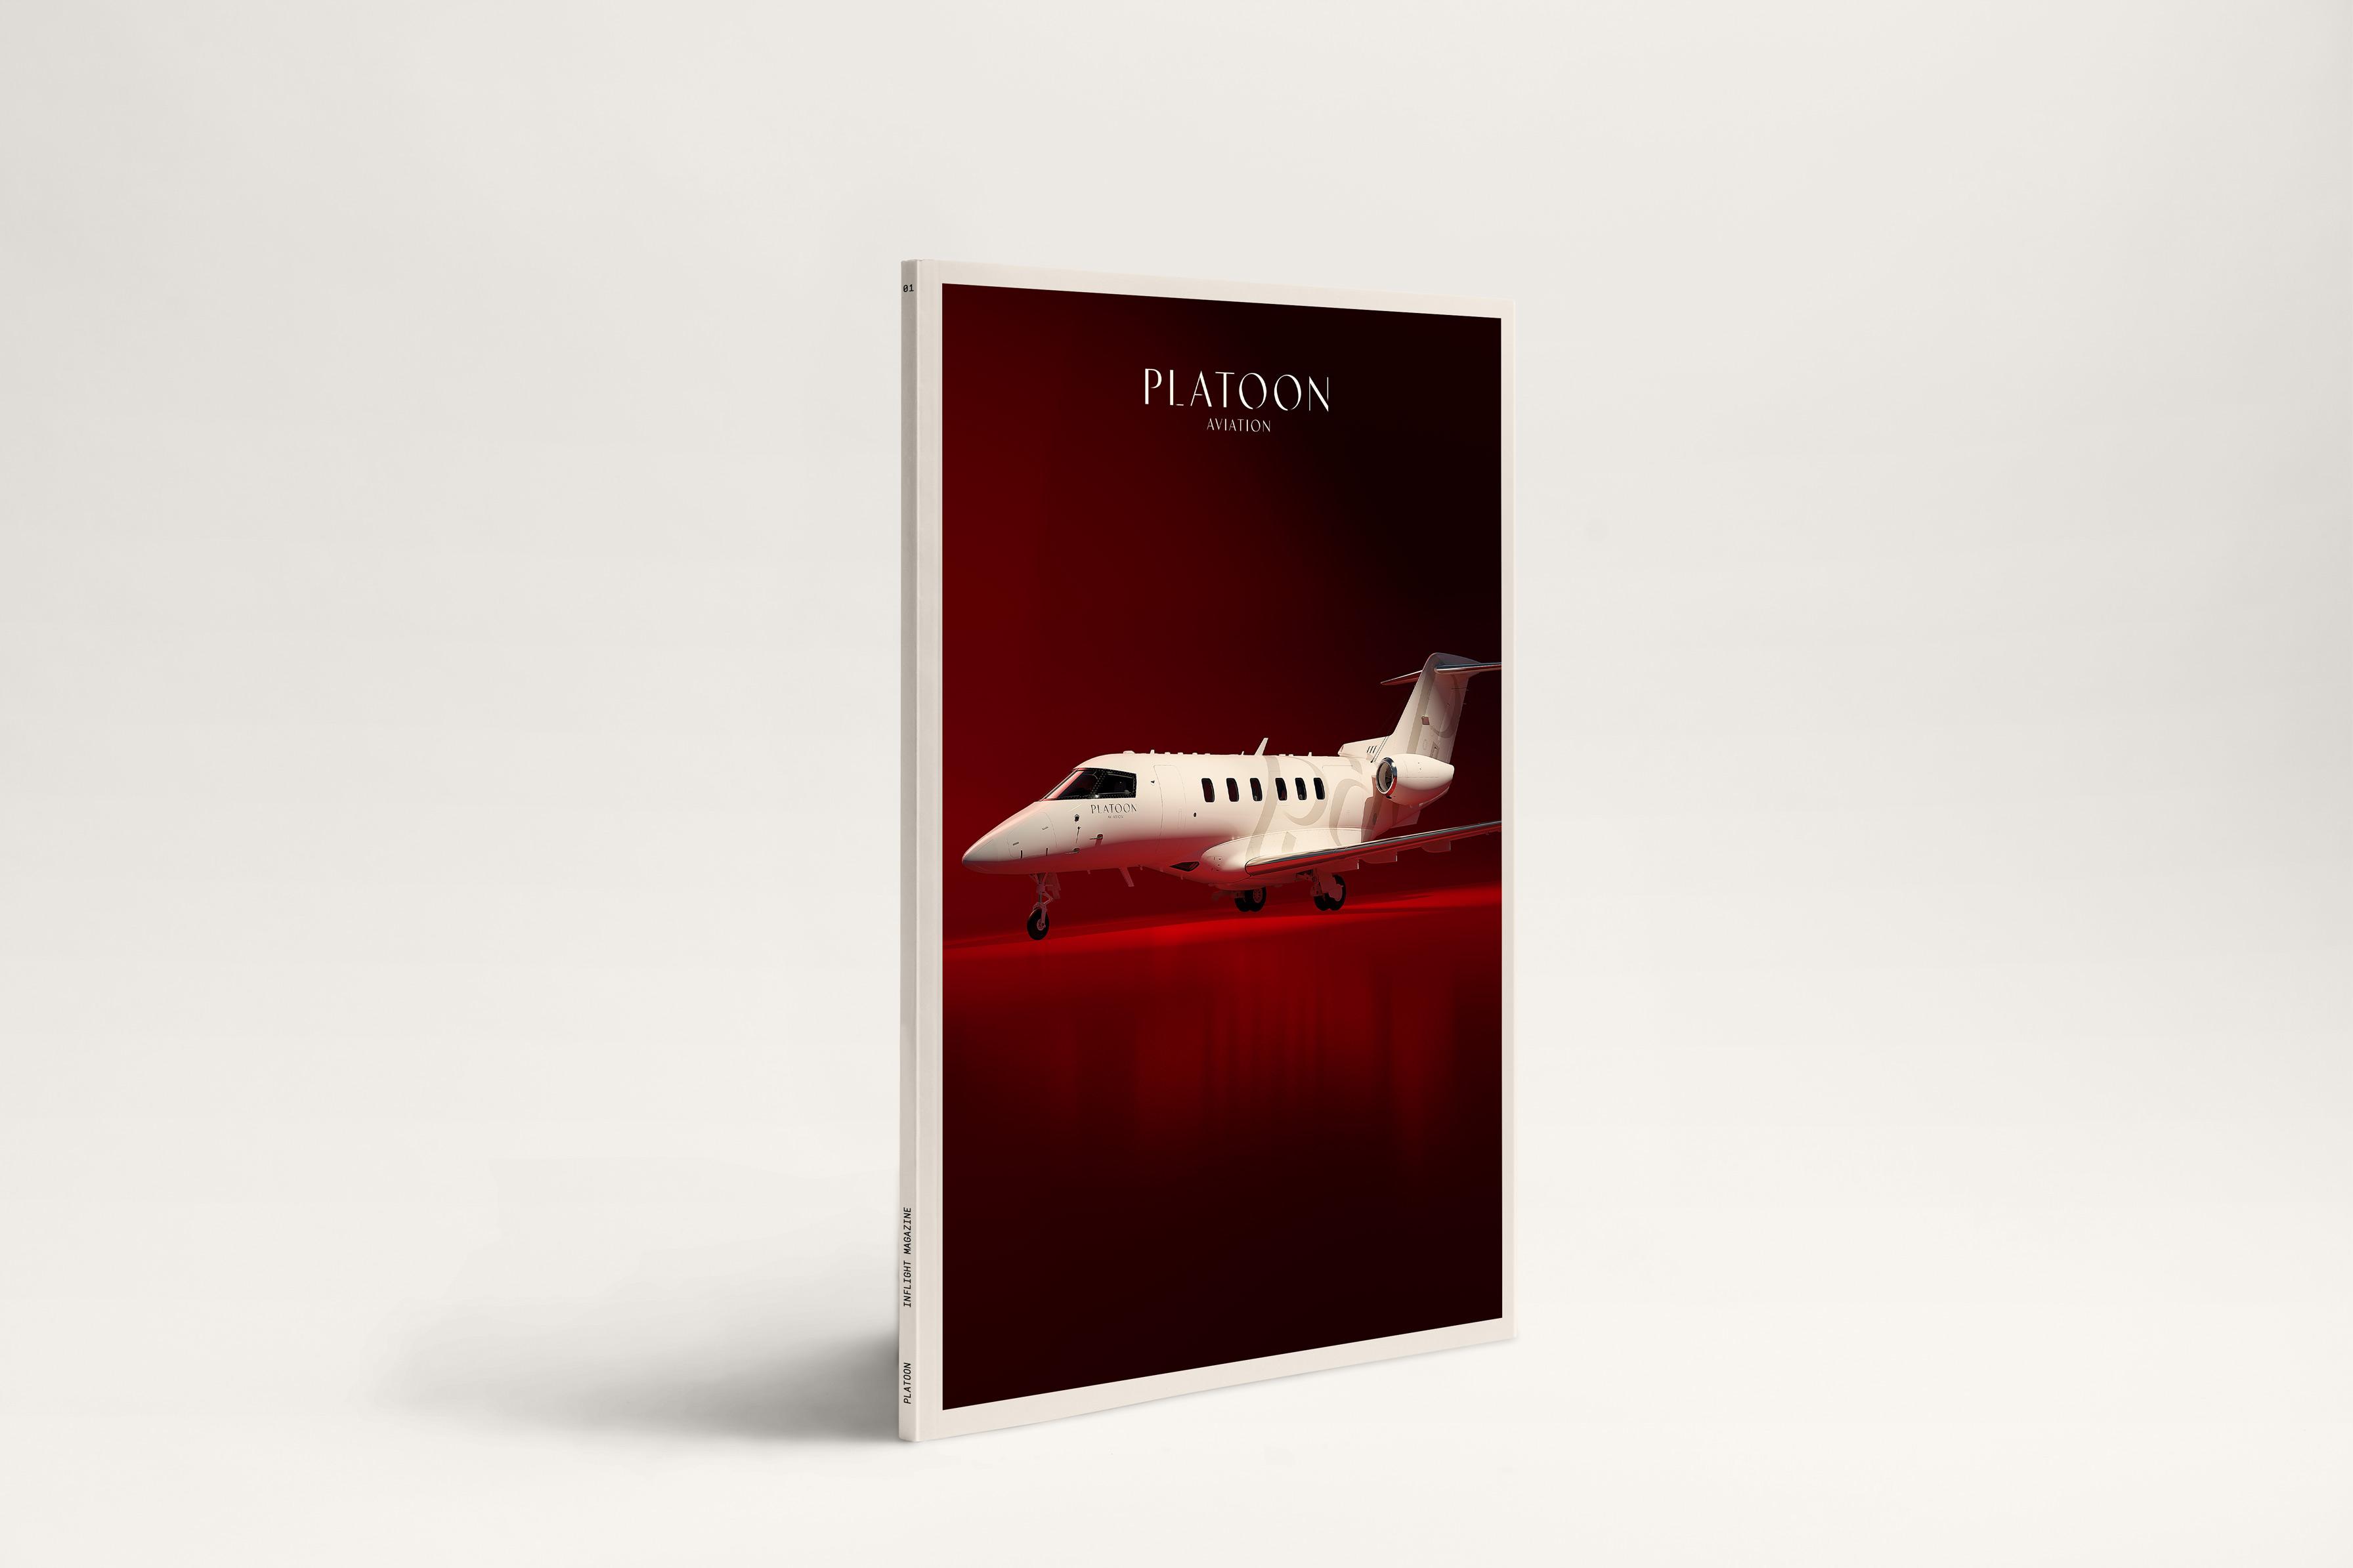 Platoon - Brand Magazine